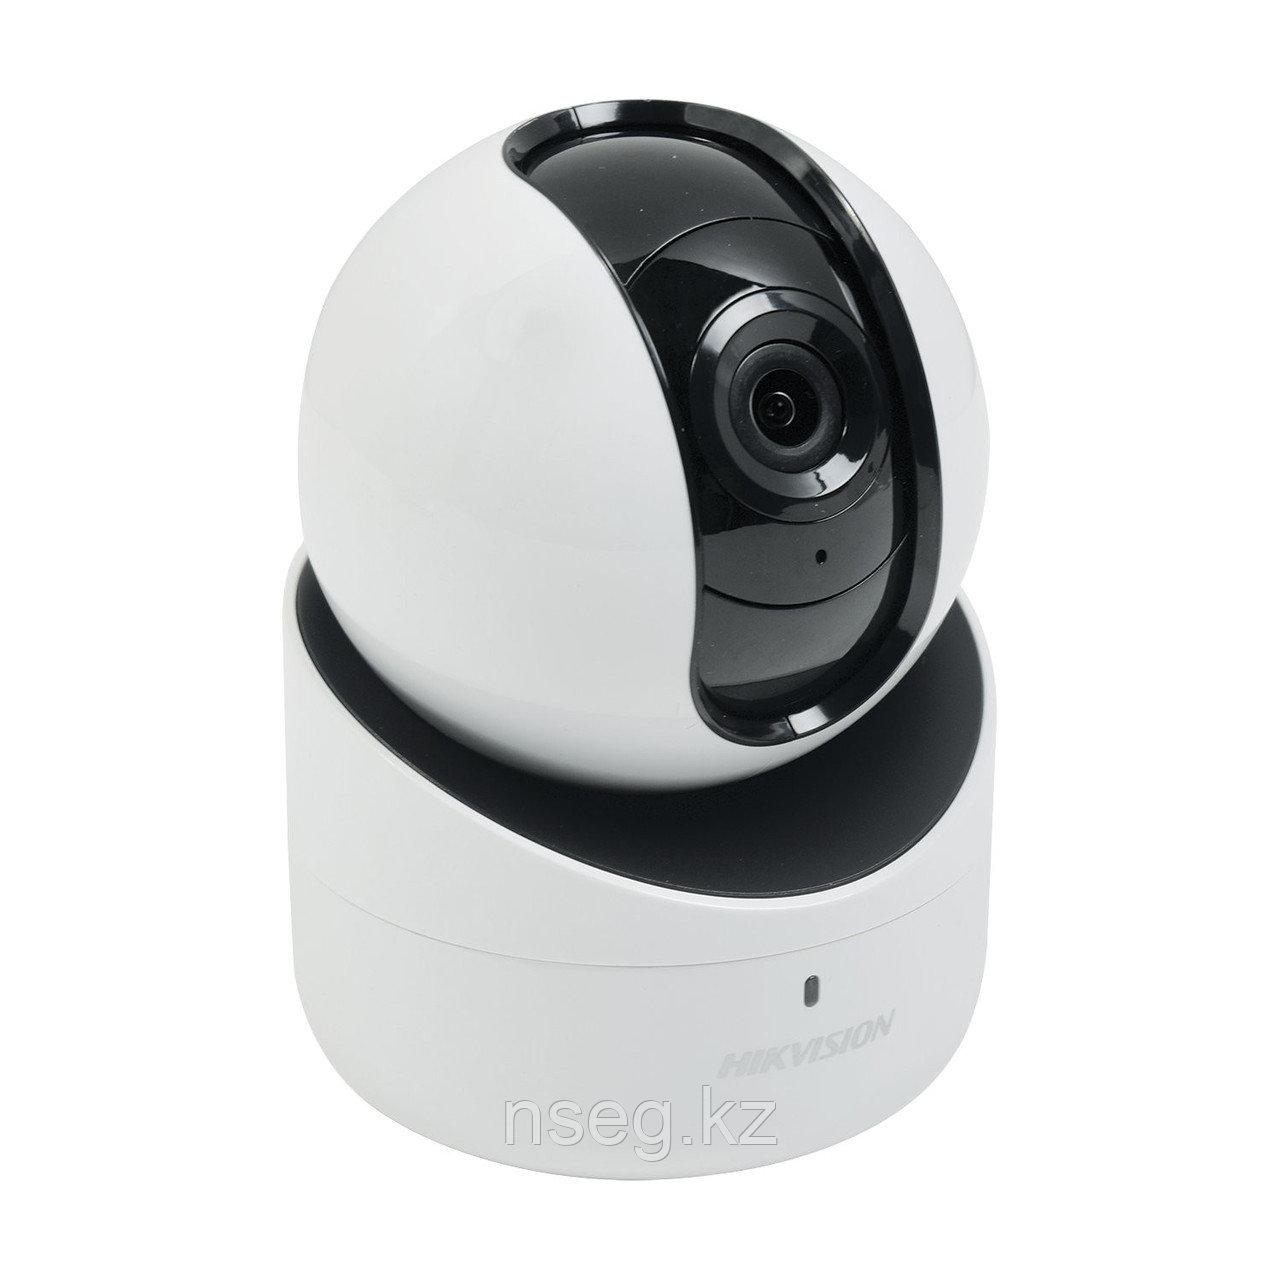 4Мп поворотная IP камера Hikvision DS-2CD2F42FWD-IWS